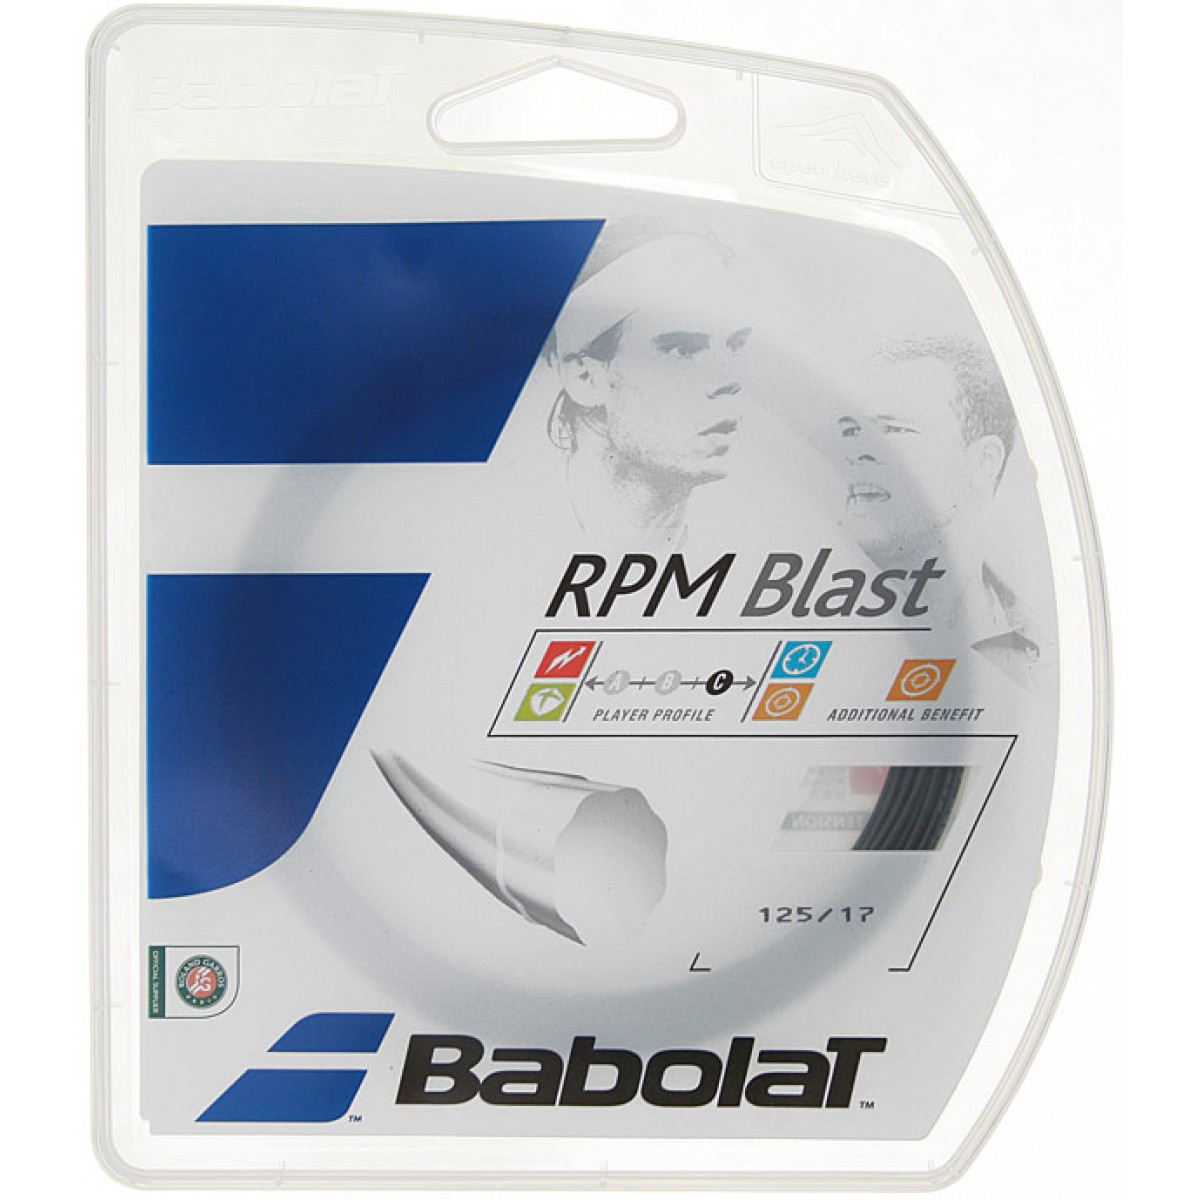 CORDAGE BABOLAT RPM BLAST (12 METRES)